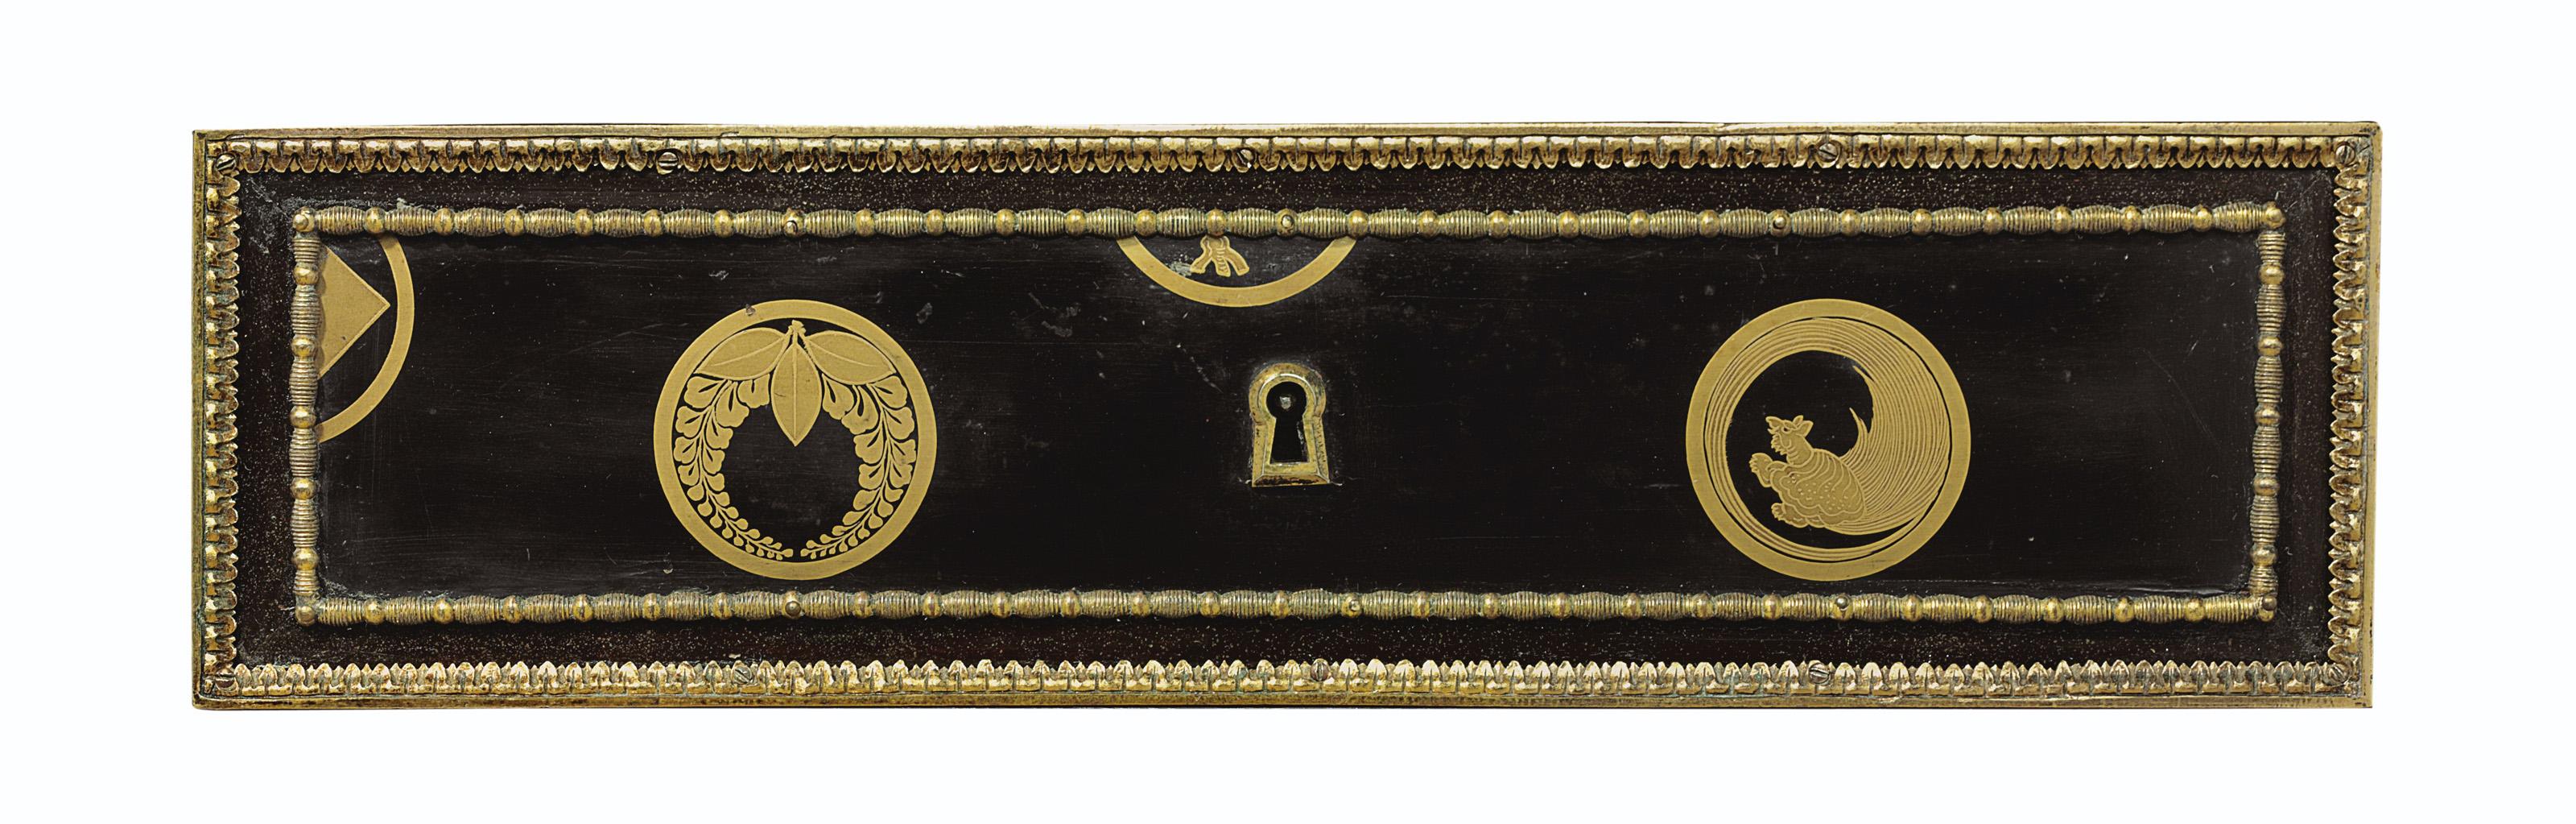 A LOUIS XVI ORMOLU-MOUNTED EBO